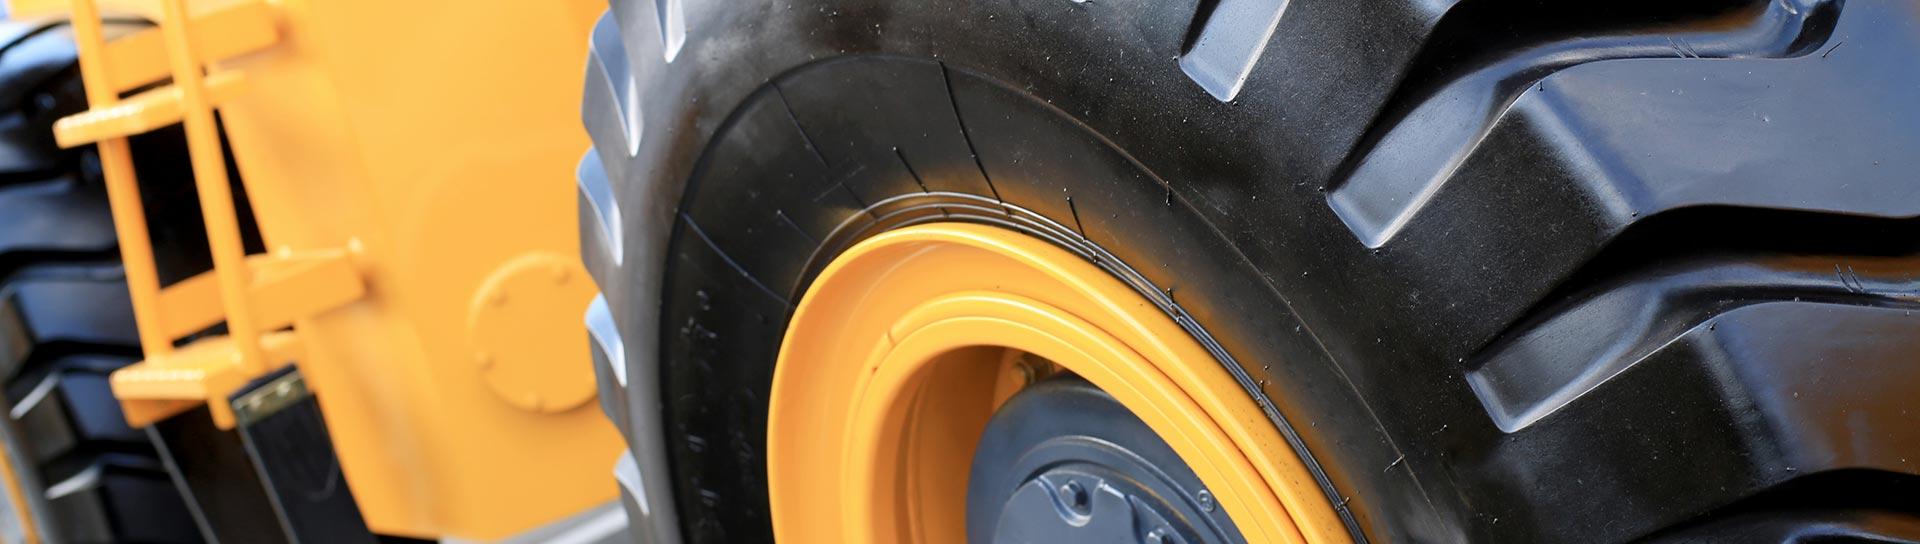 truck wheel close up